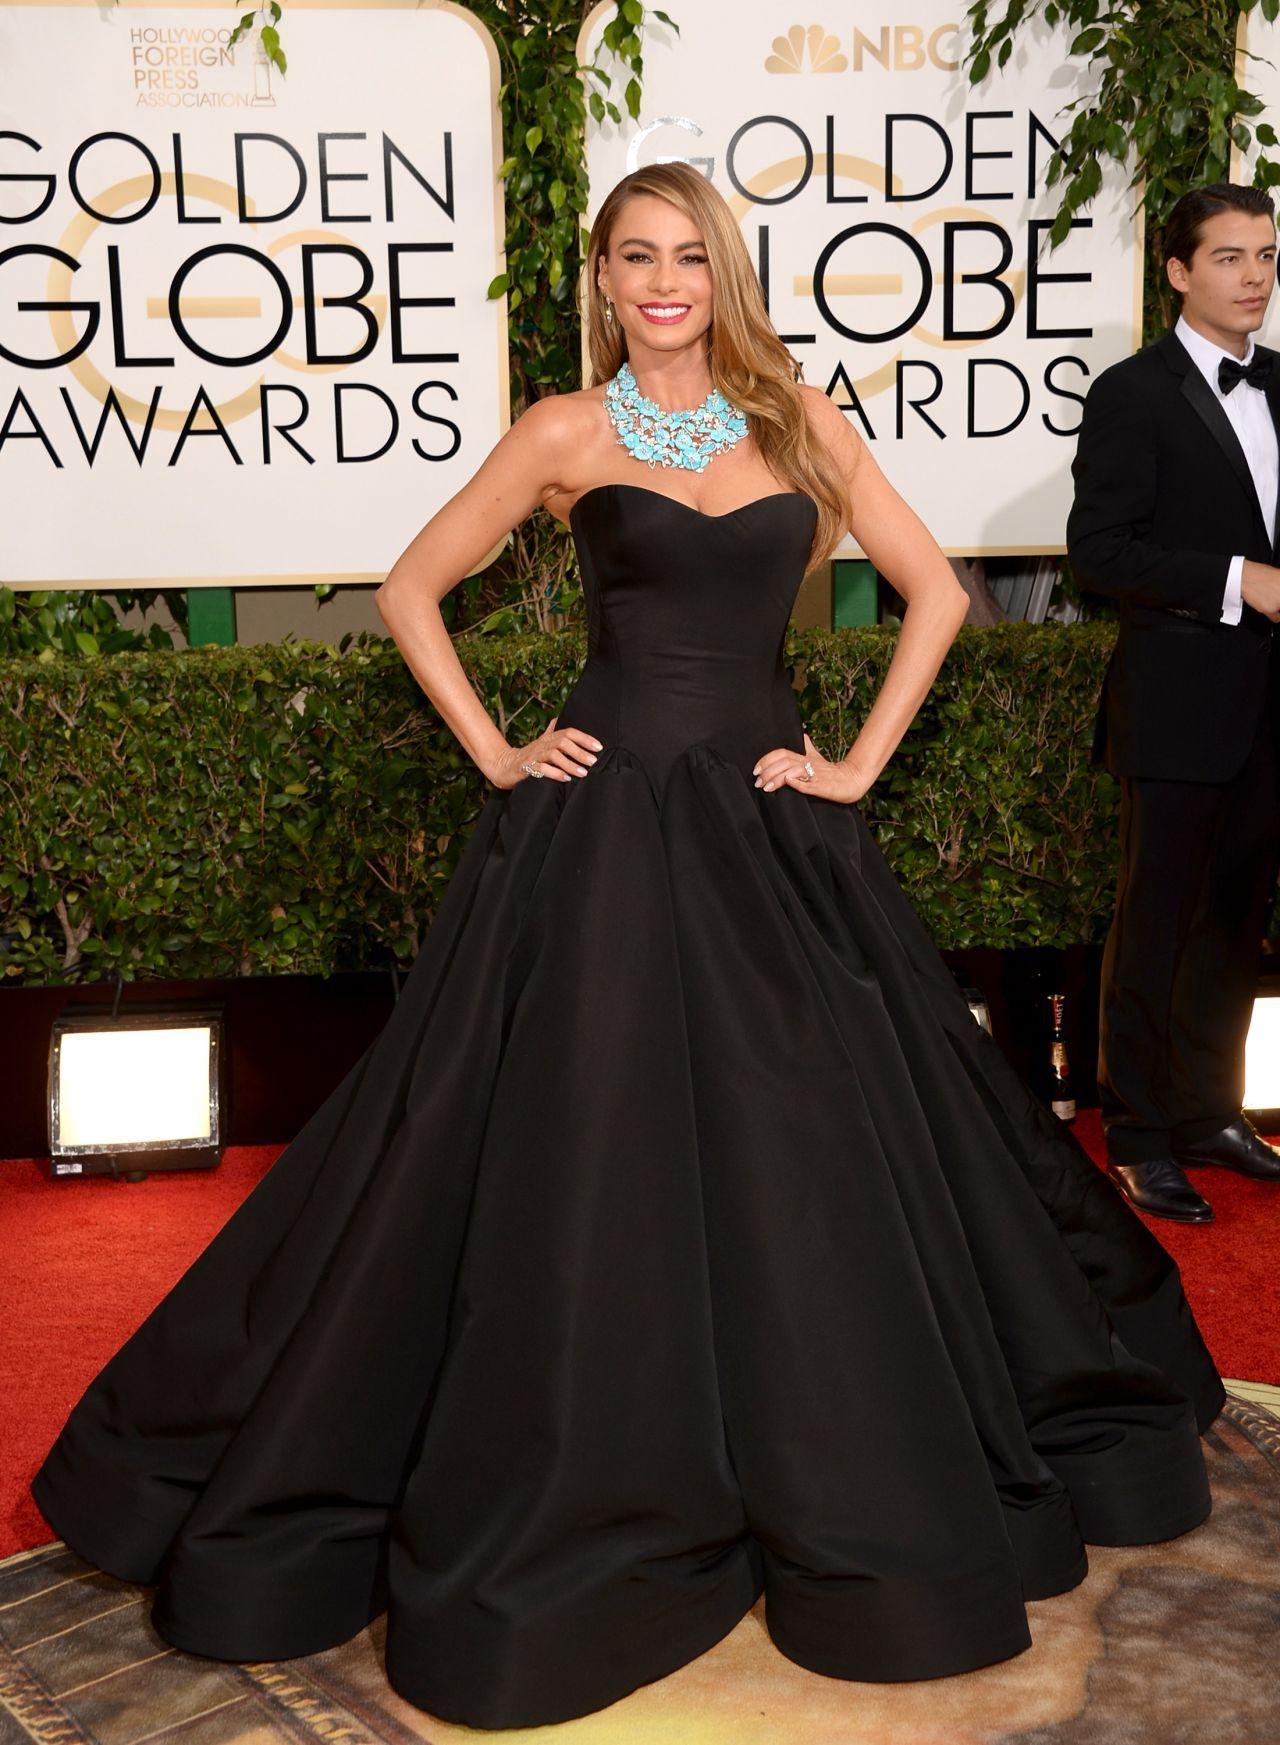 Sofia Vergara wearing @zacposen and Lorraine Schwartz jewelry – Golden Globe Awards #2014